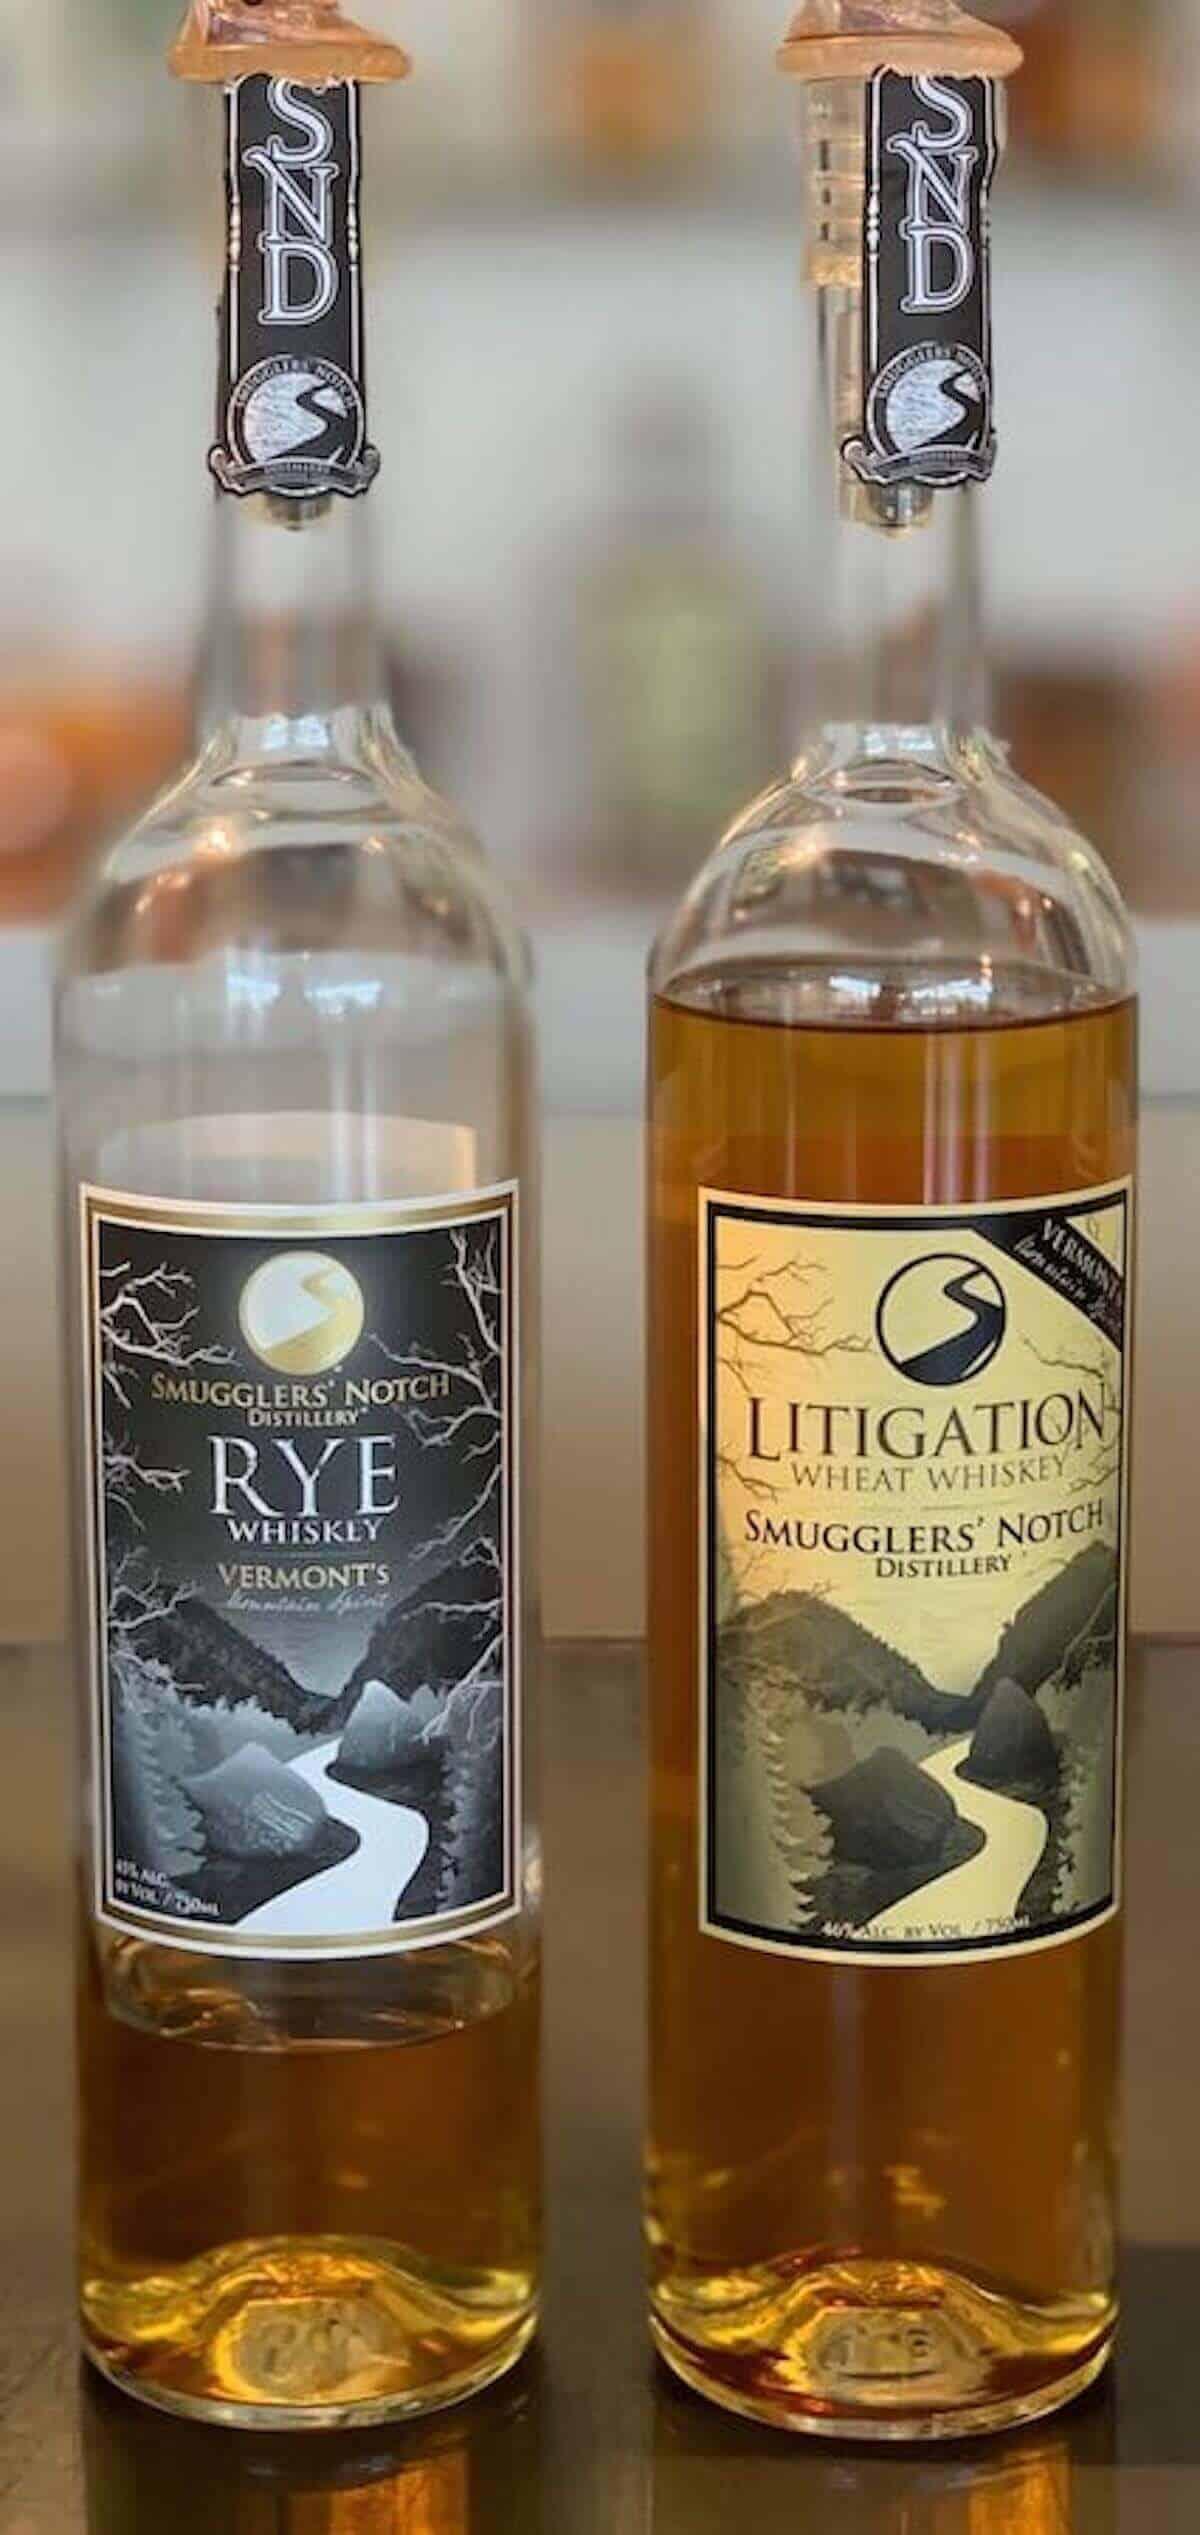 Smugglers' Notch Distillery Litigation wheat whiskey rye whiskey